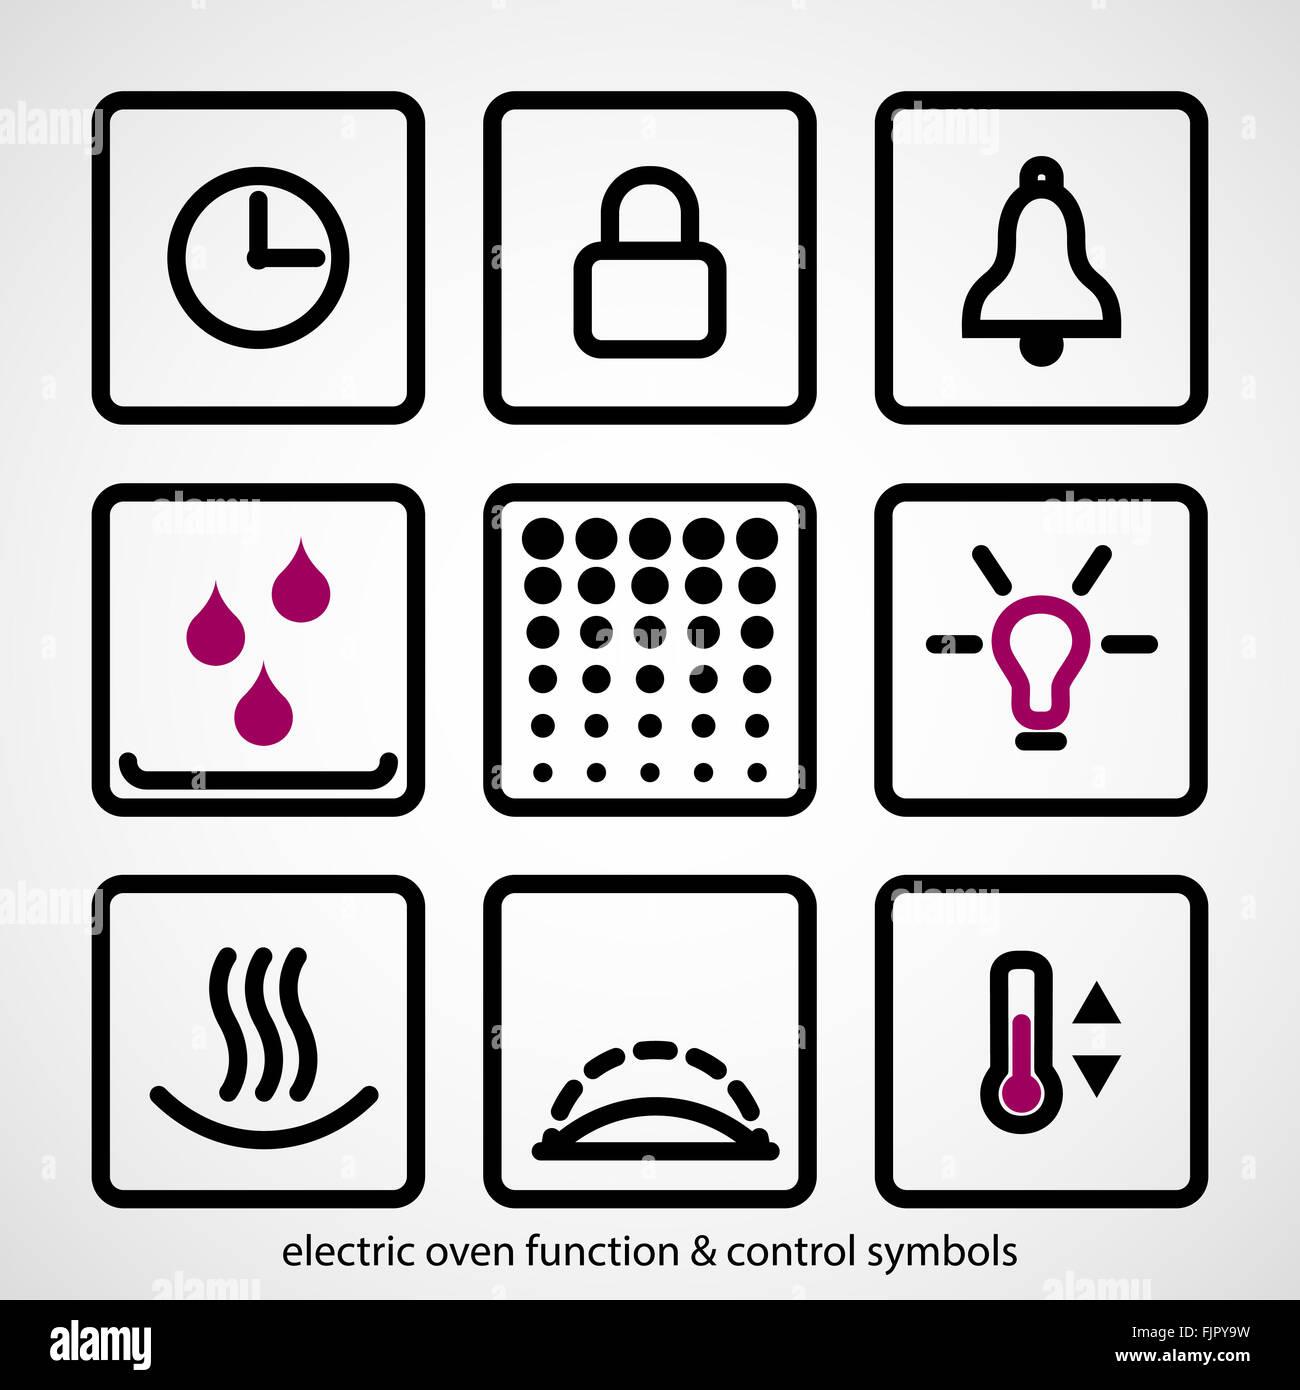 Elektro Backofen Funktion Kontrolle Symbole Icon Sammlung